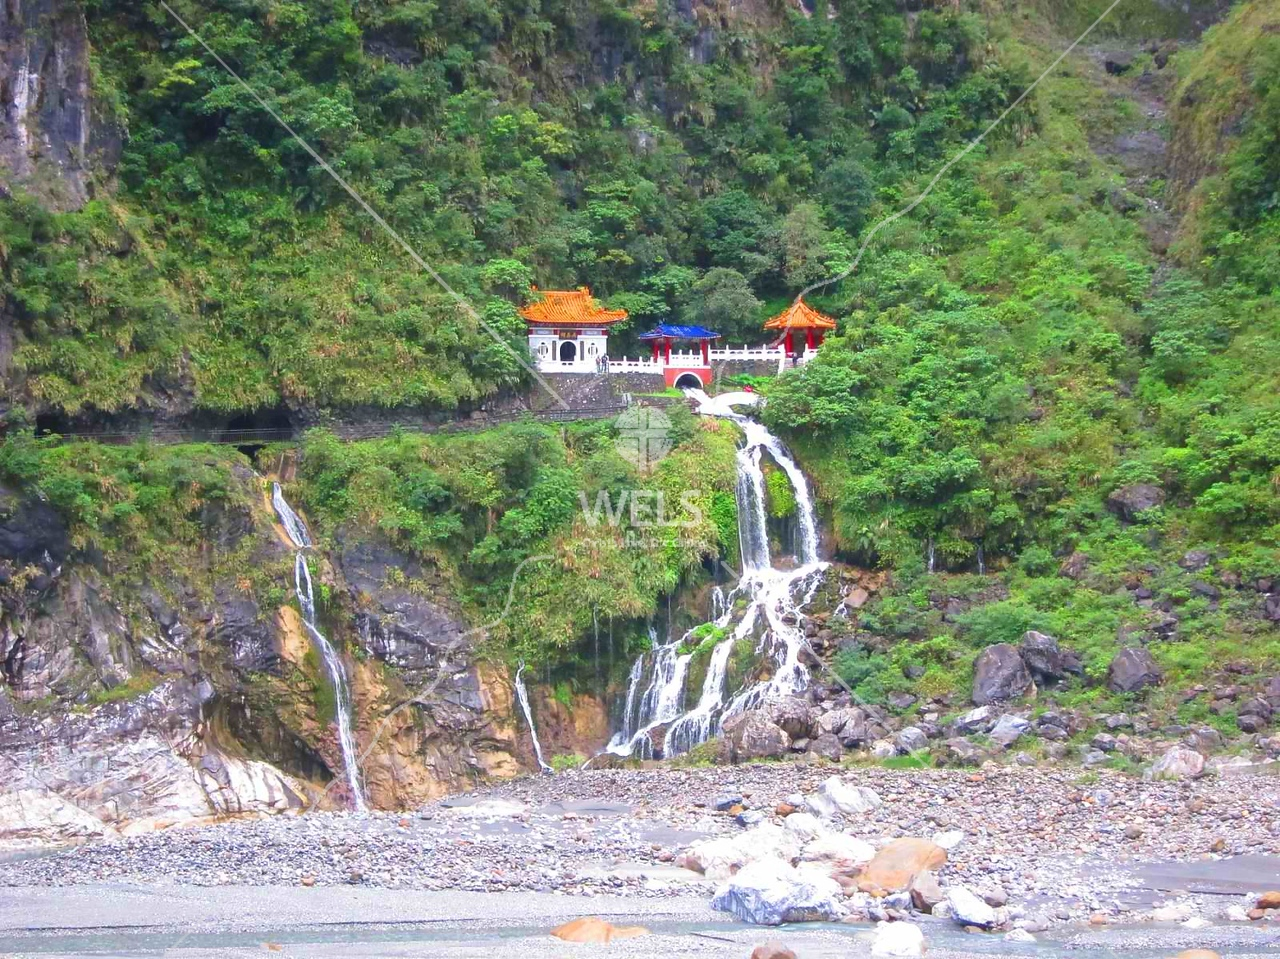 Martyrs' Shrine, Taroko Gorge, Taiwan by kstellick